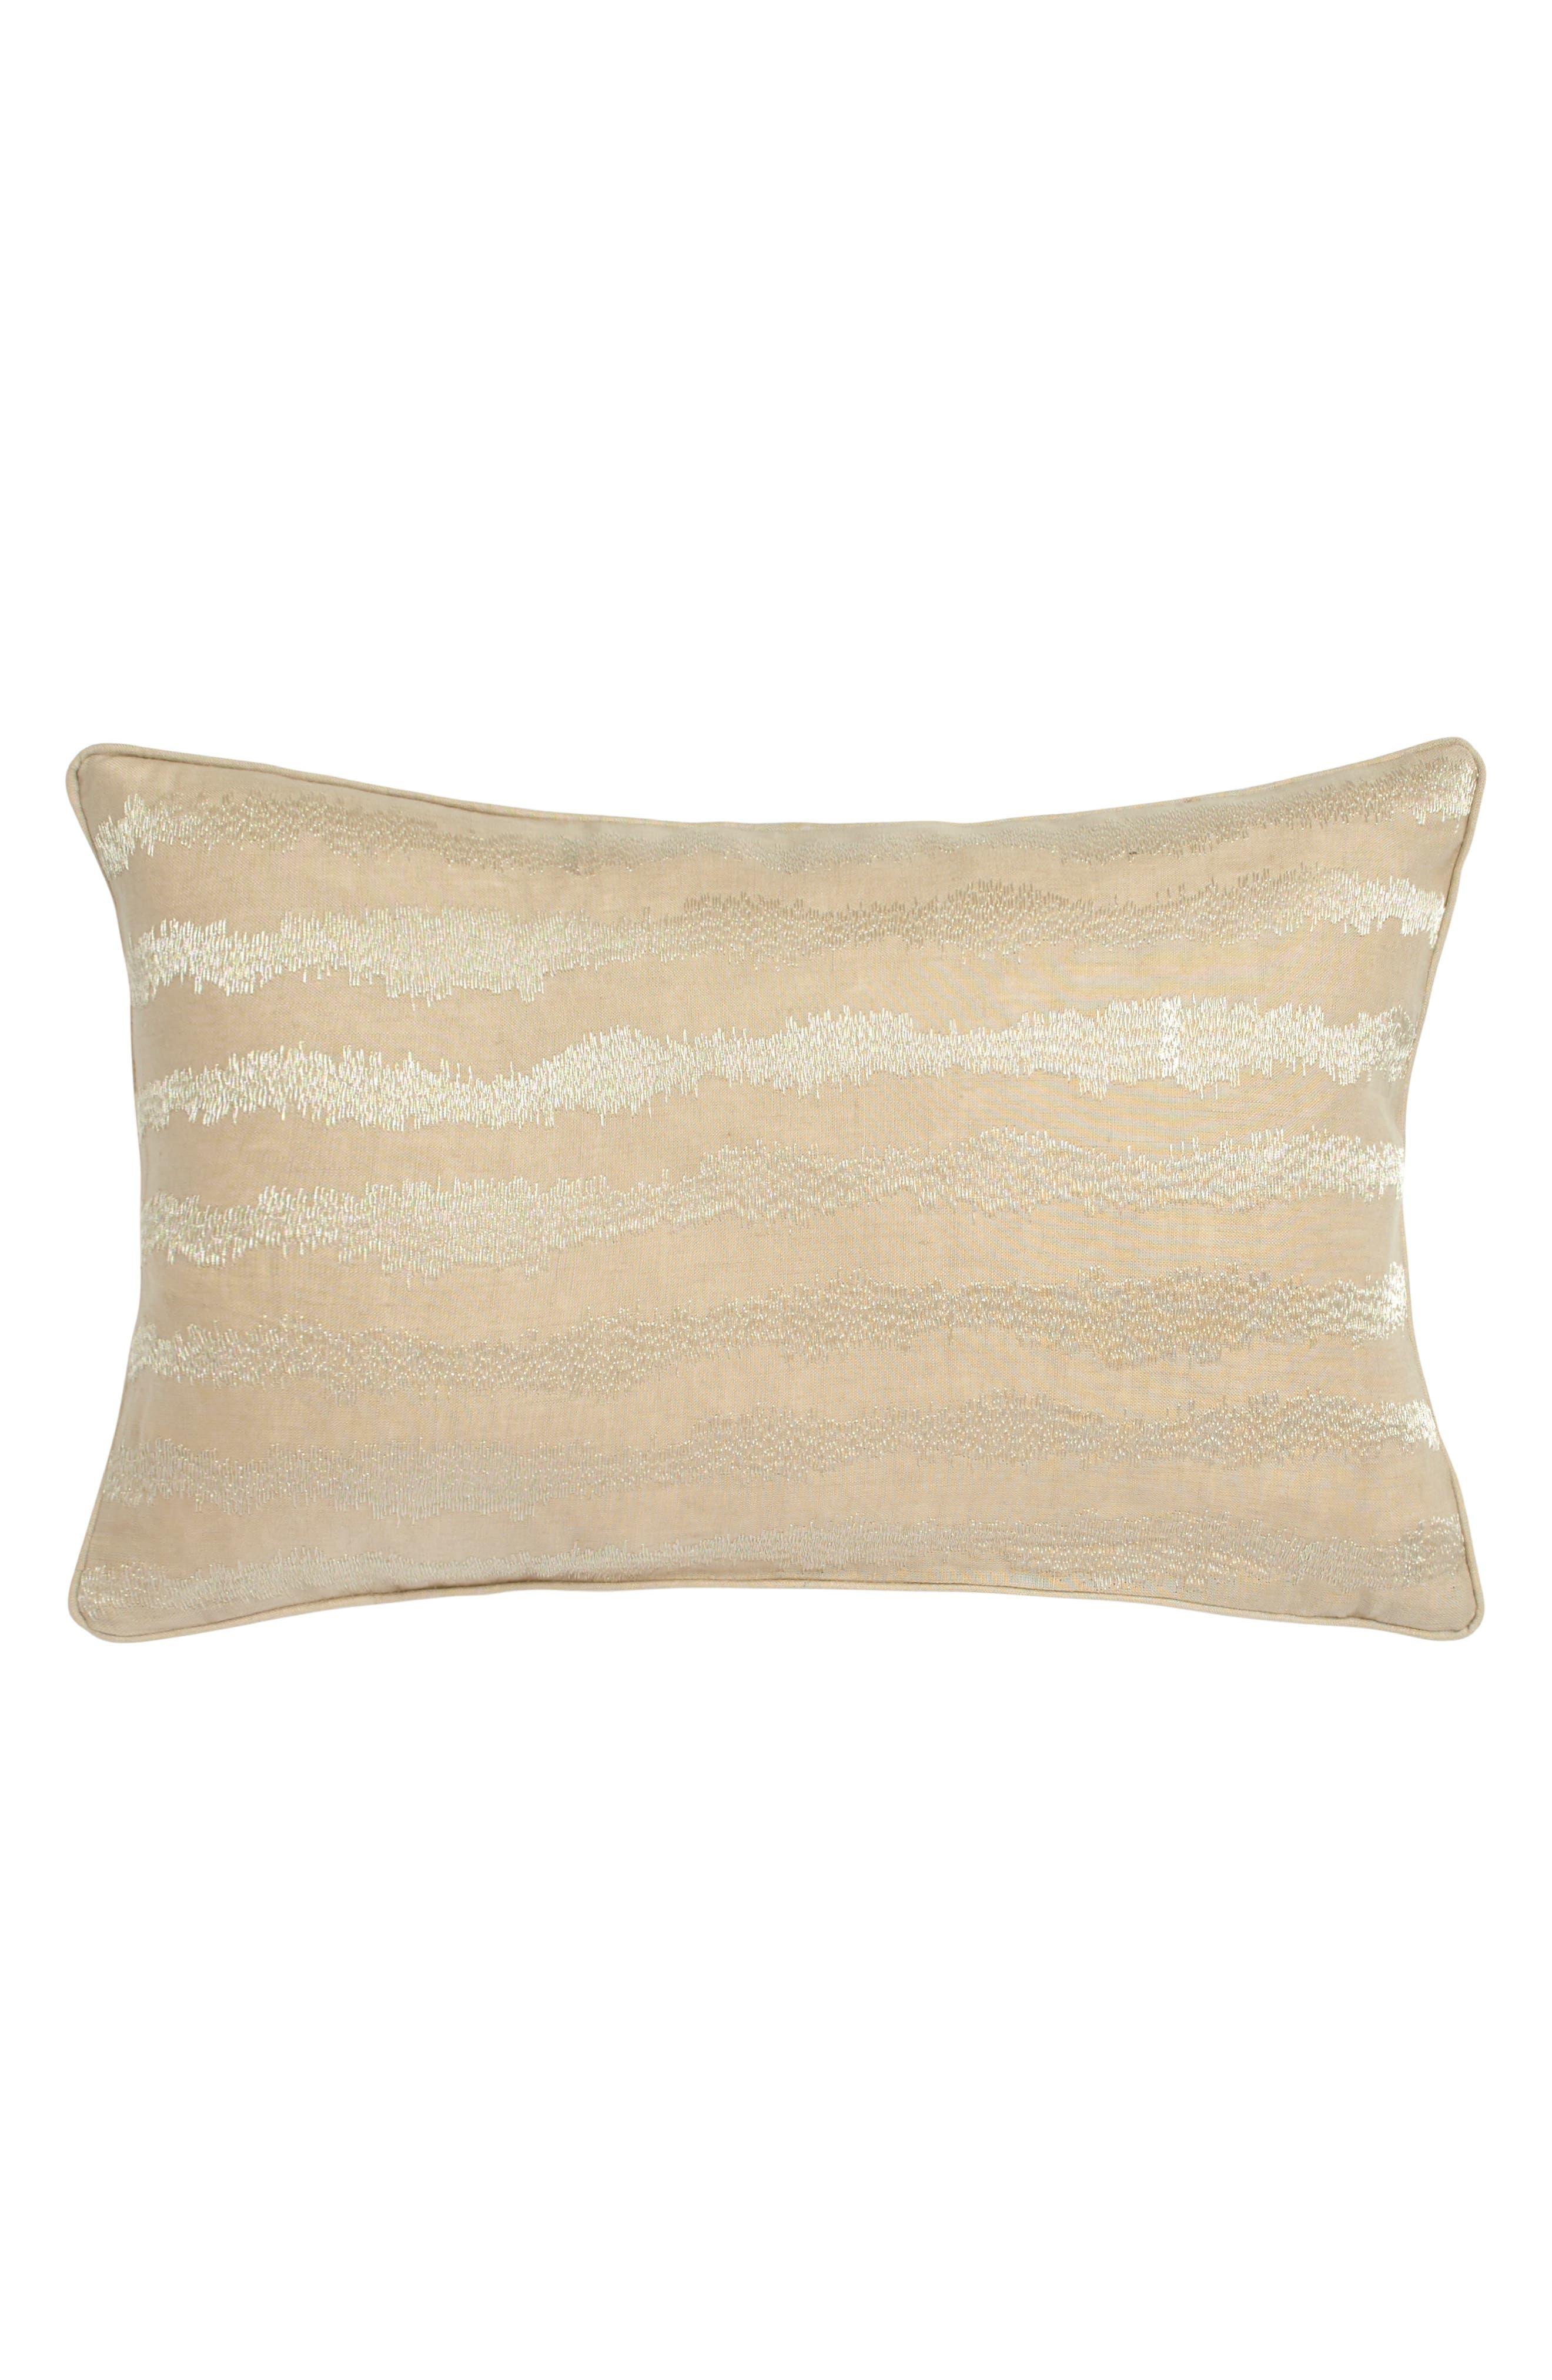 Main Image - Harlequin Makrana Accent Pillow